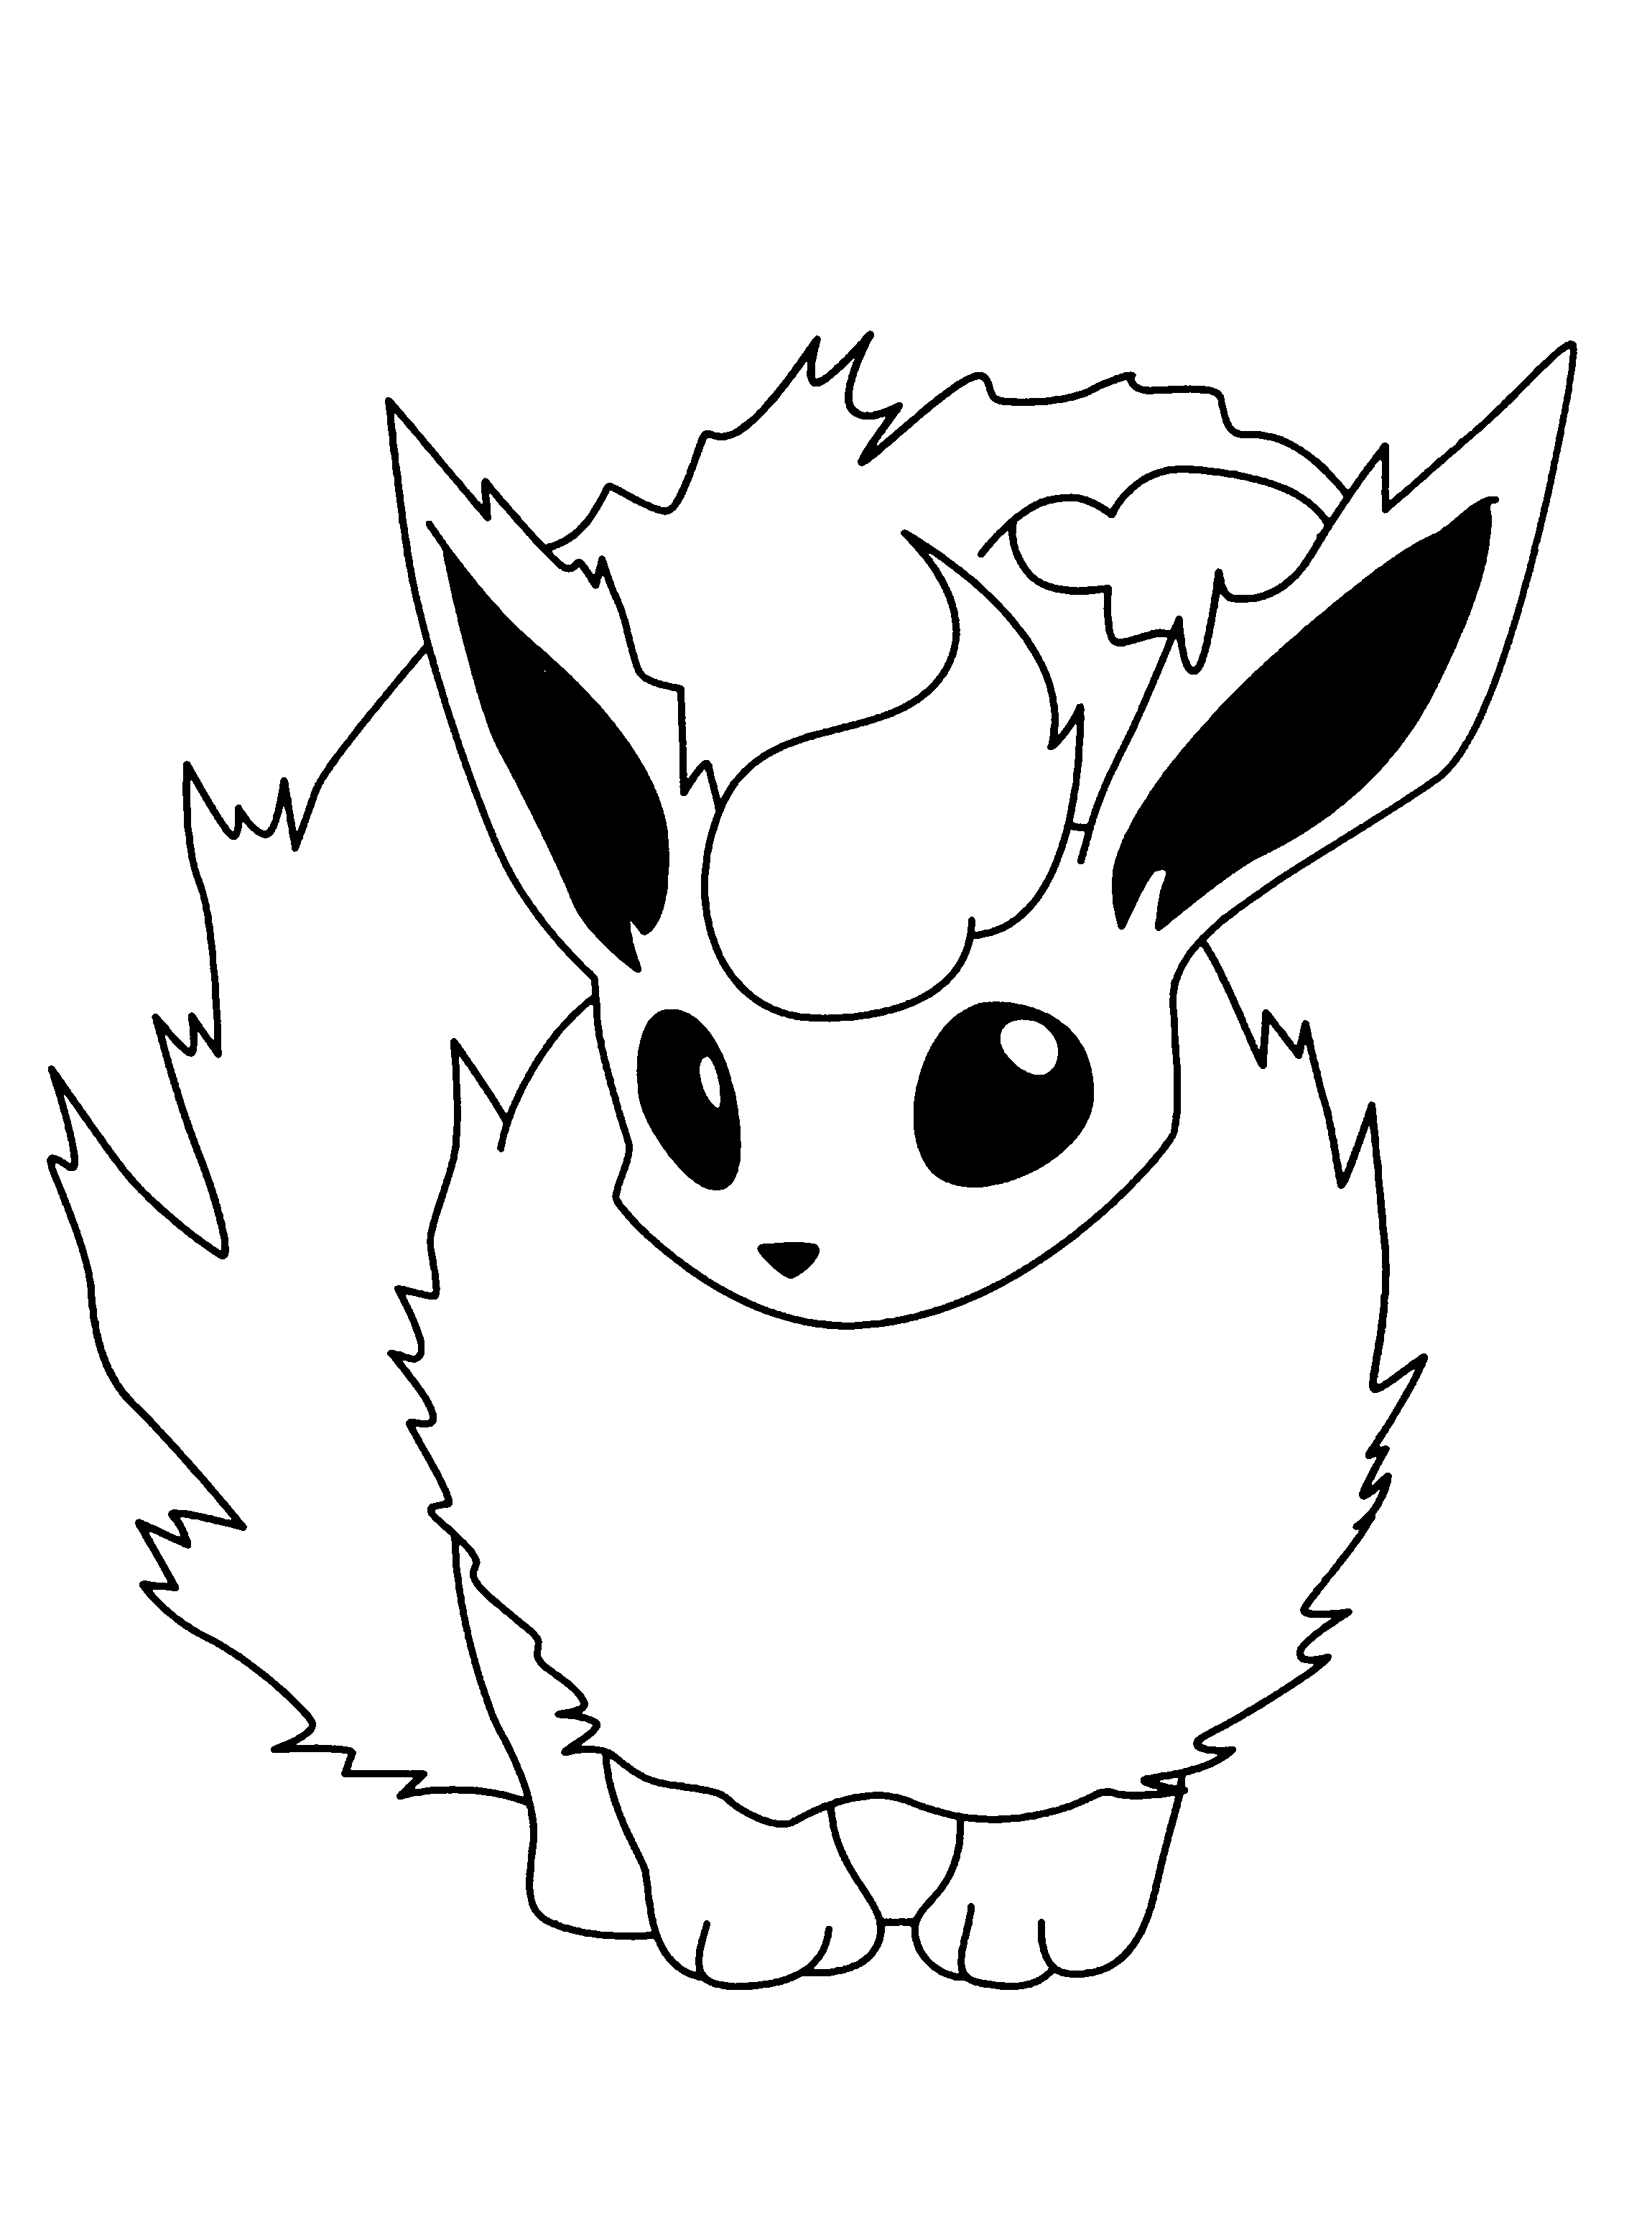 2300x3100 Incridible Raskraska Pokemon For Pokemon Coloring Pages On With Hd